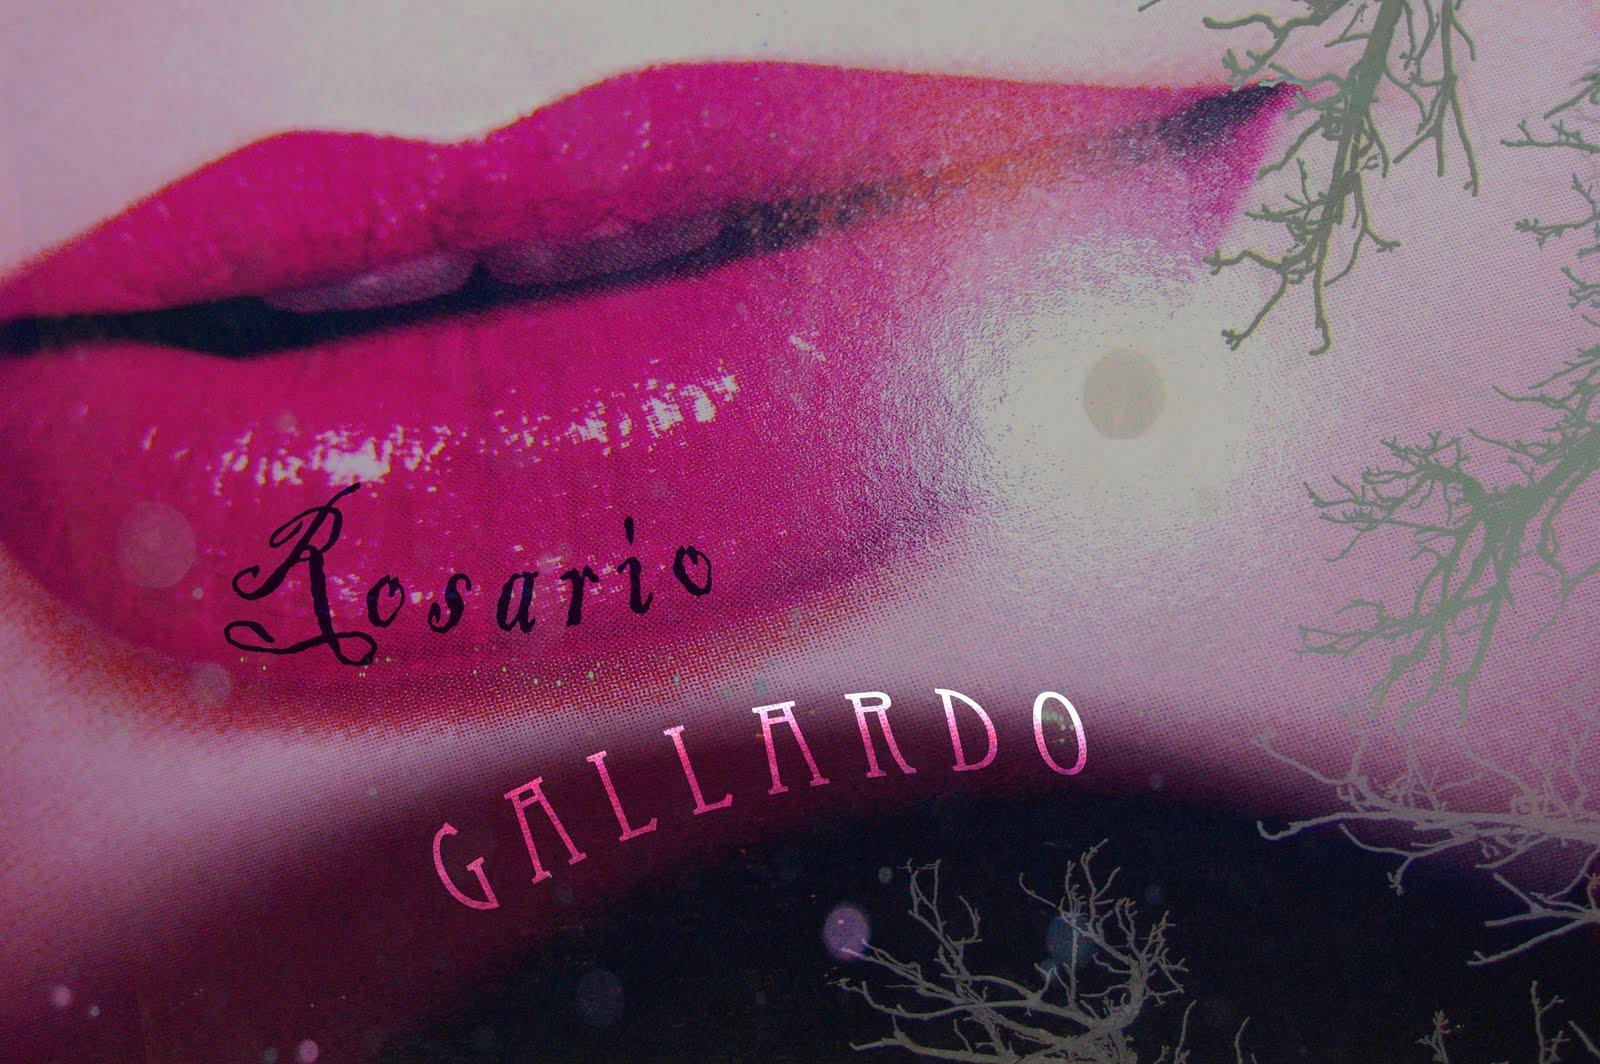 Rosario Gallardo